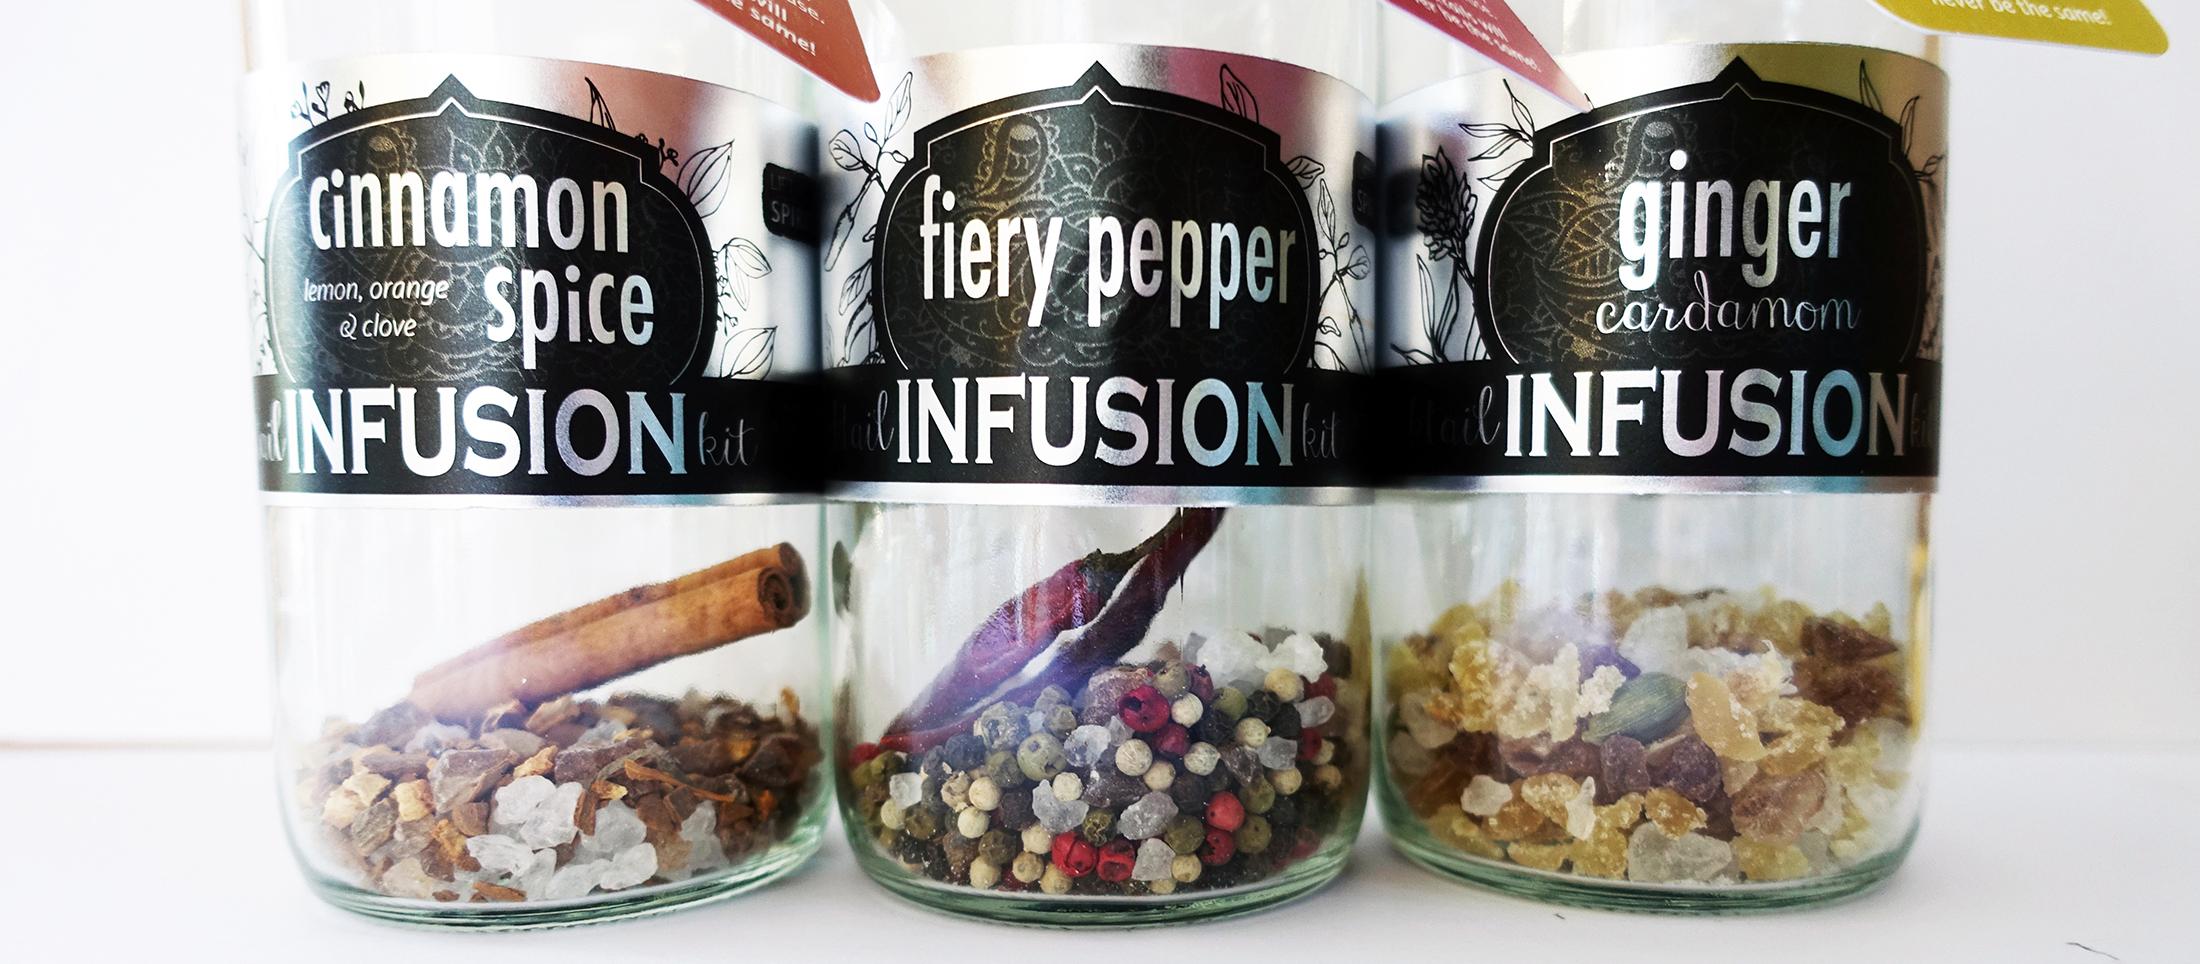 rokz infusion bottle kits